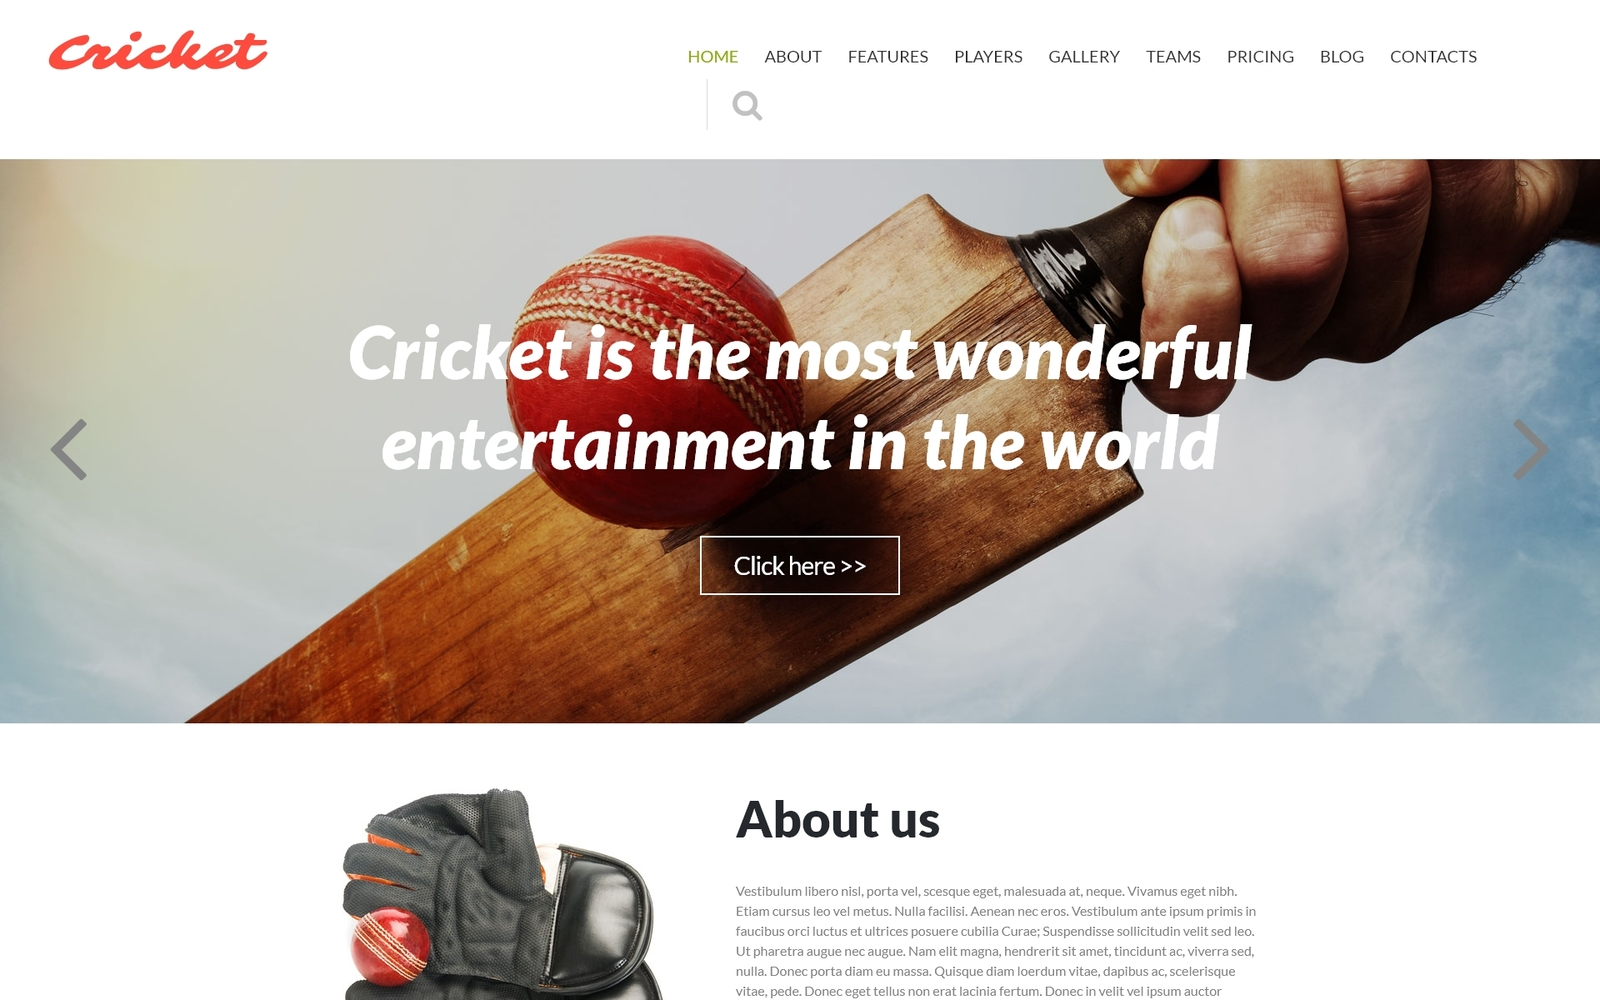 """Cricket Club Joomla Template"" Responsive Joomla Template №53716"